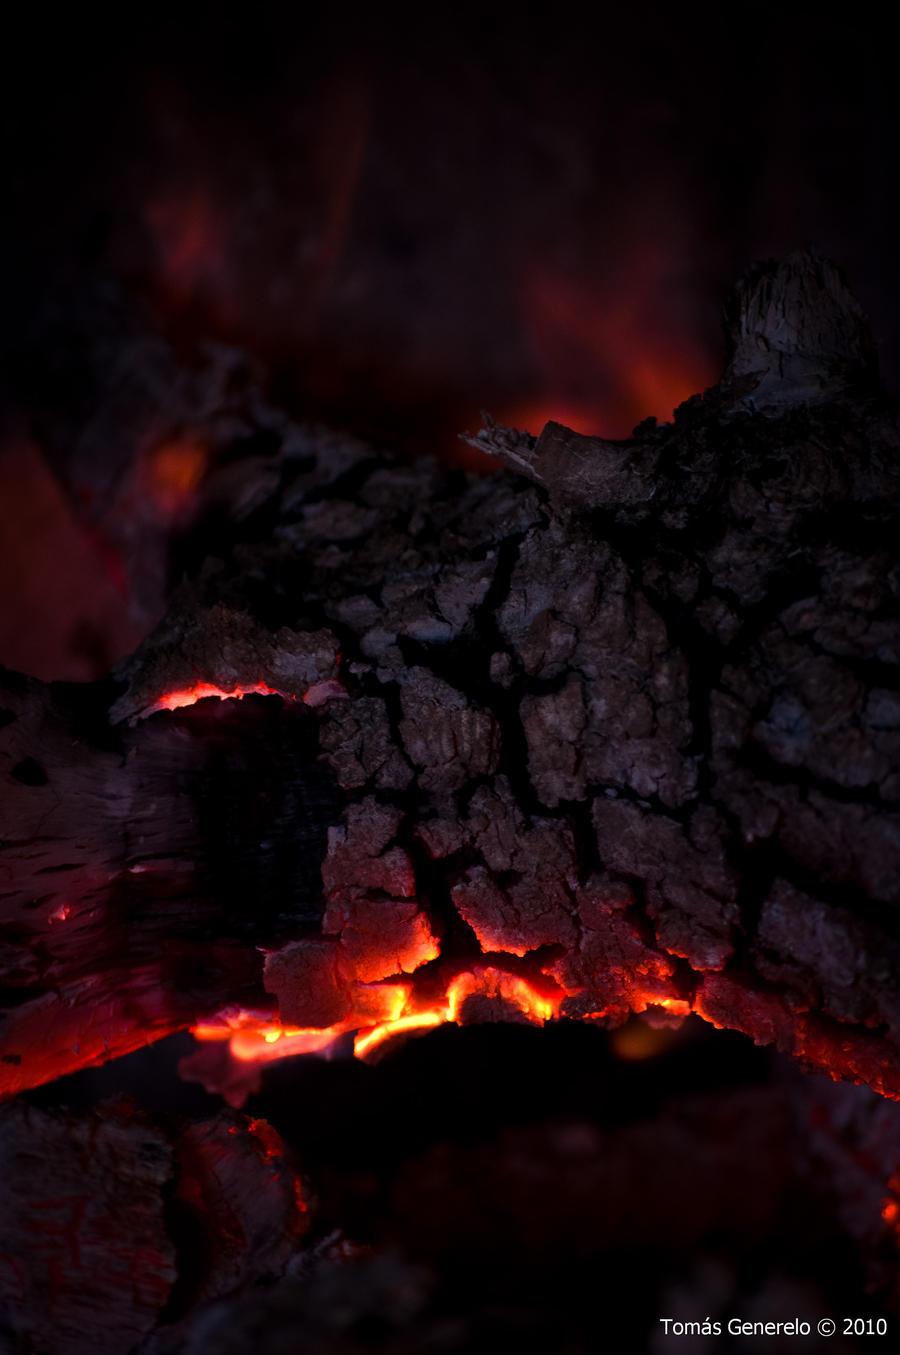 Fotógrafos de Crew (Exile) - Página 2 Fire_2_by_shuff_shuff-d35w3c1